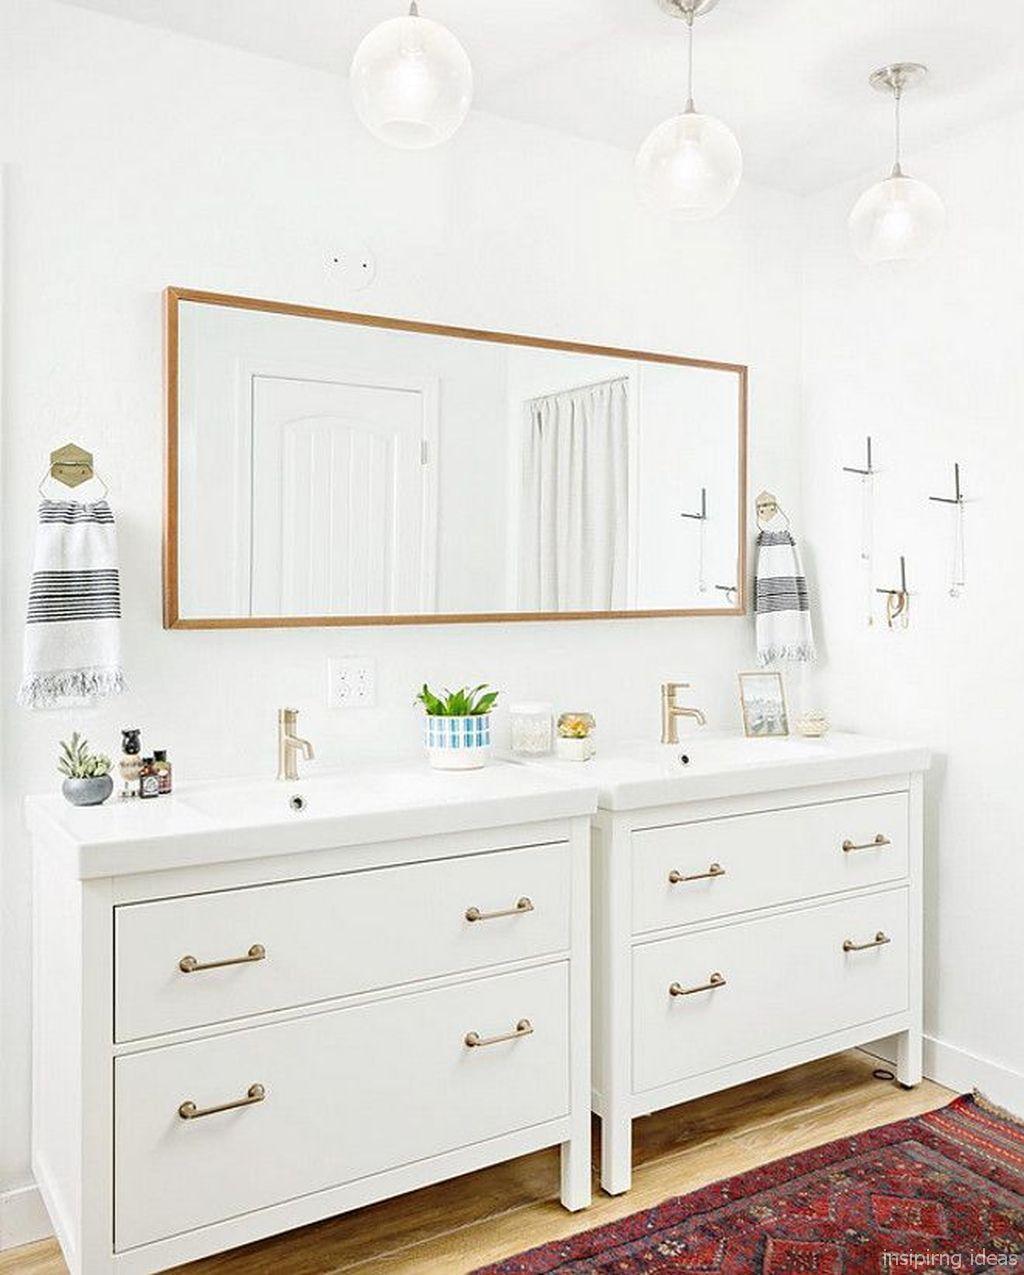 37 awesome modern farmhouse bathroom vanity ideas with on ikea bathroom vanities id=60627